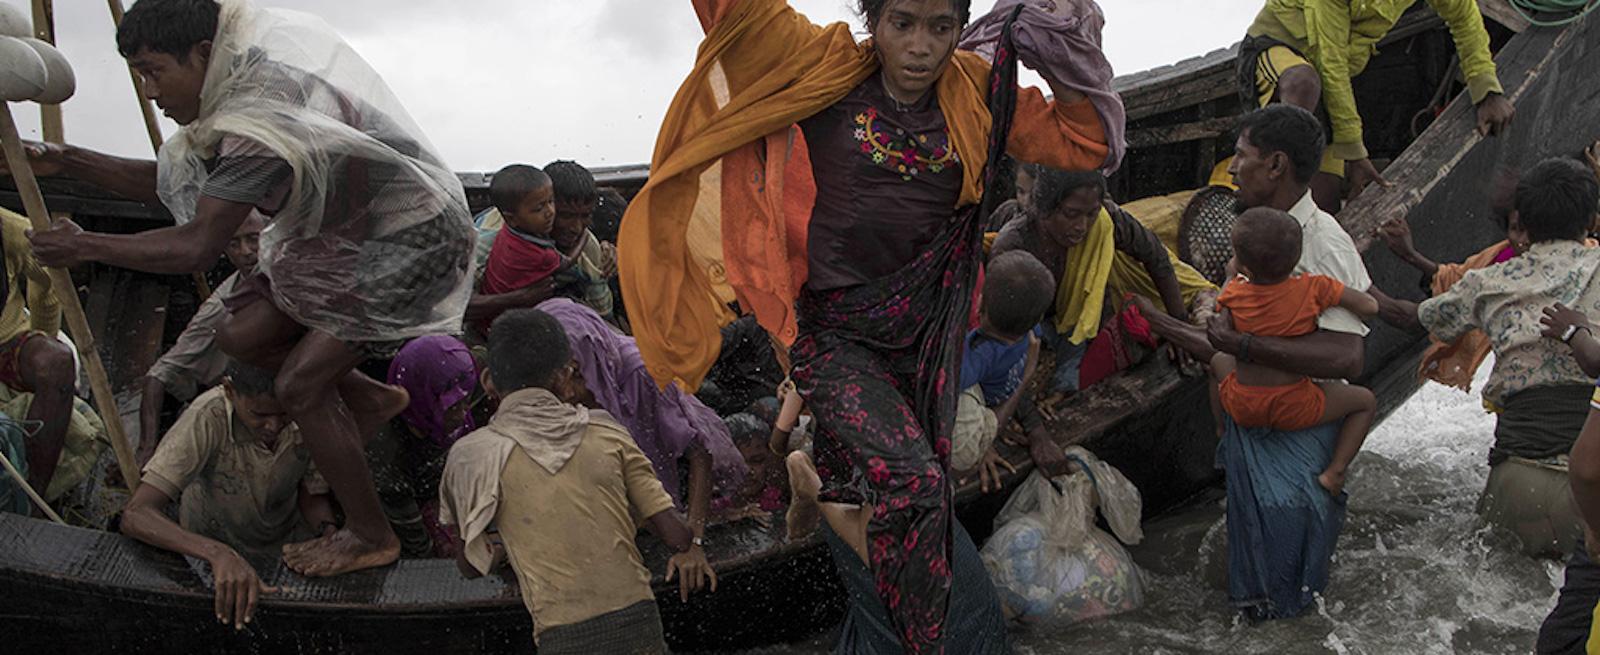 Rohingya refugees attempt to escape Myanmar (Photo: Jordi Bernabeu Farrús via Flickr)